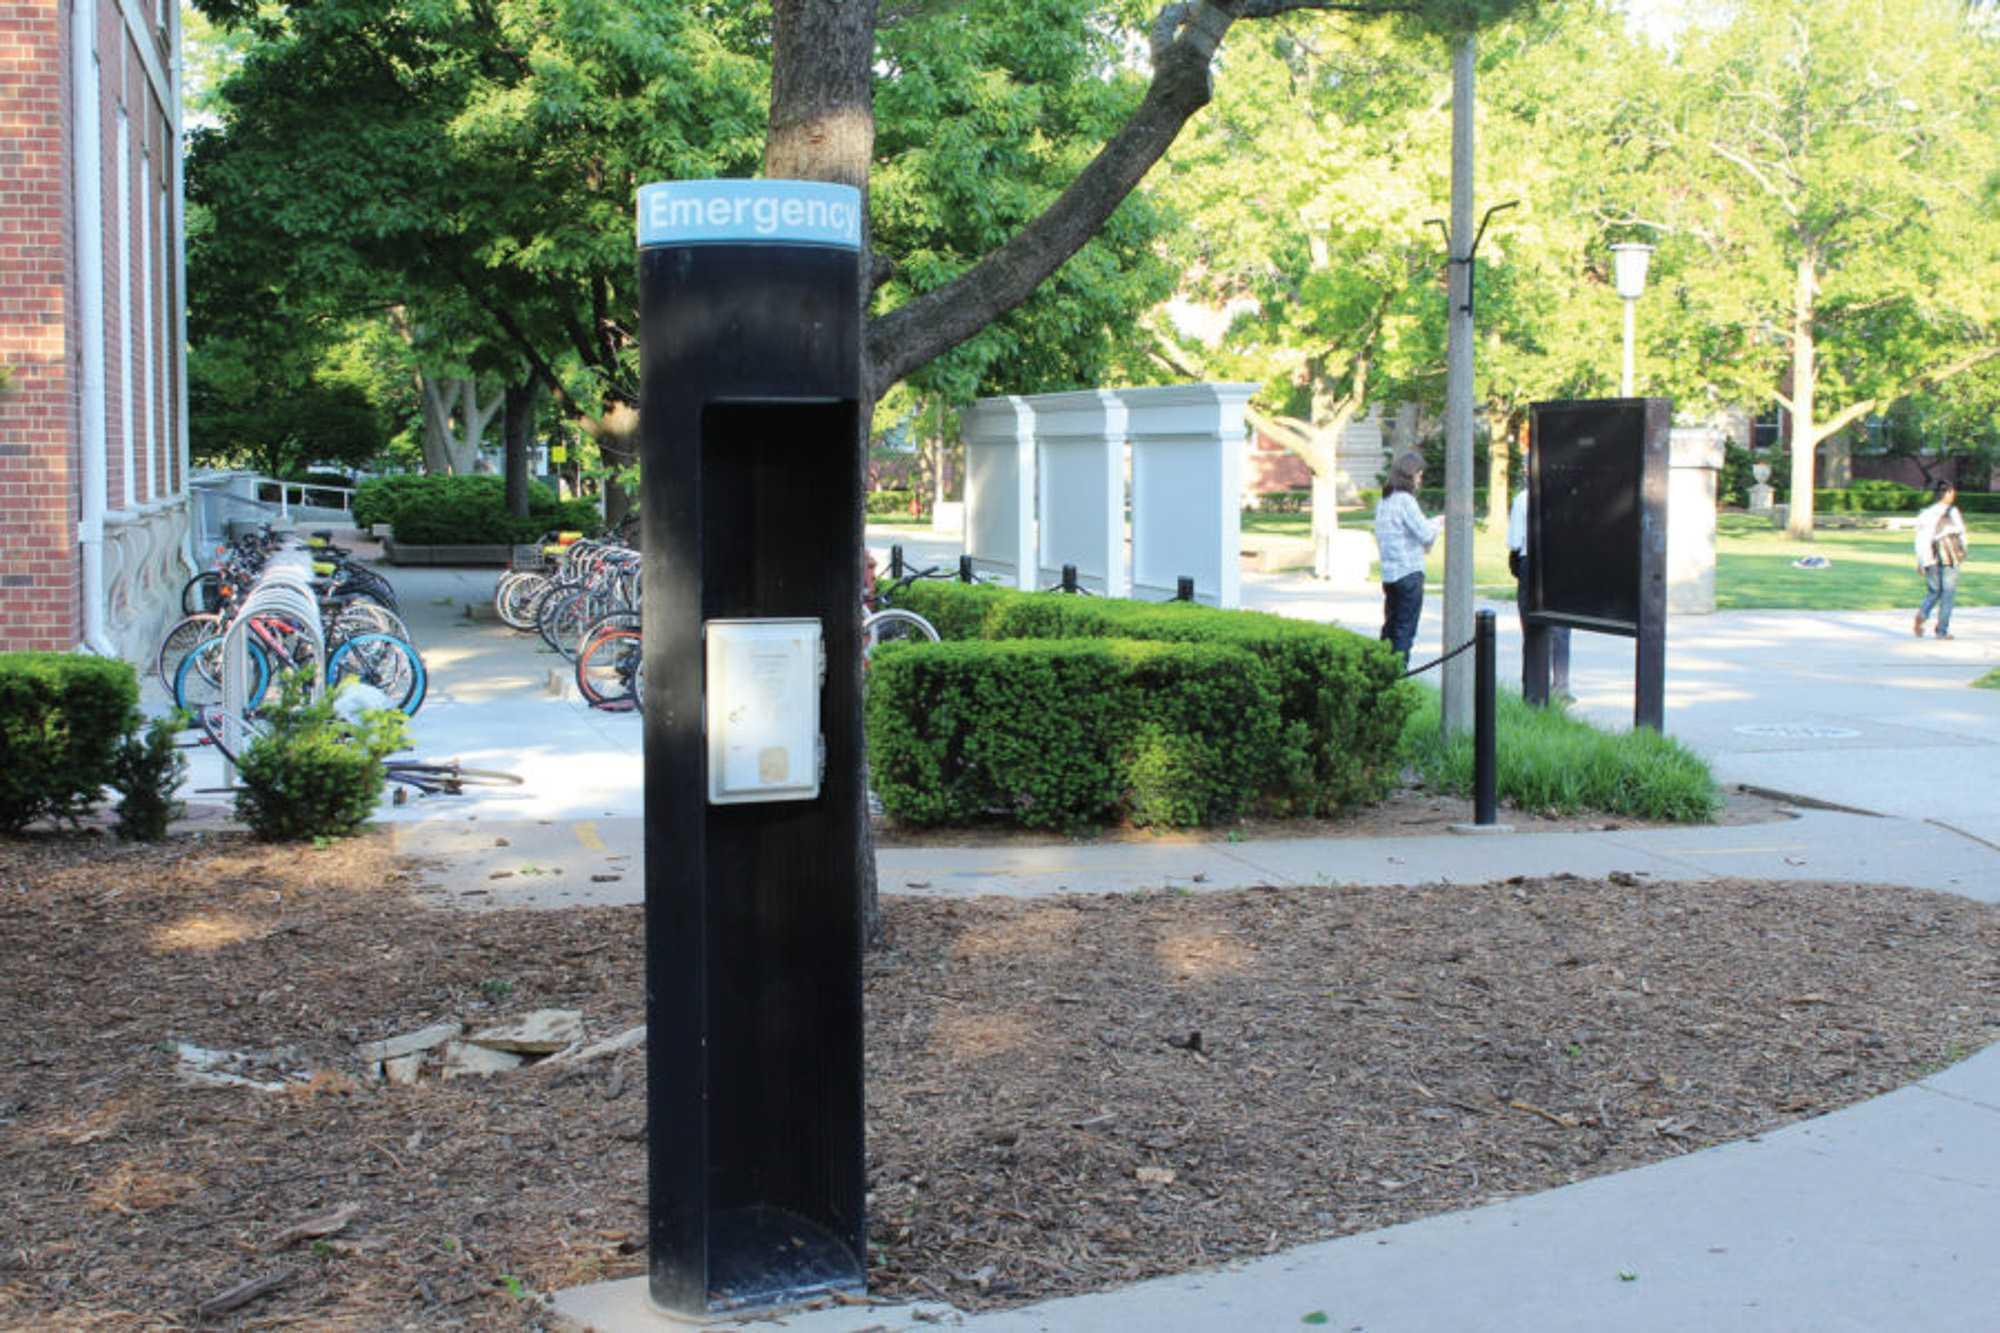 An emergency pole seen on the quad.